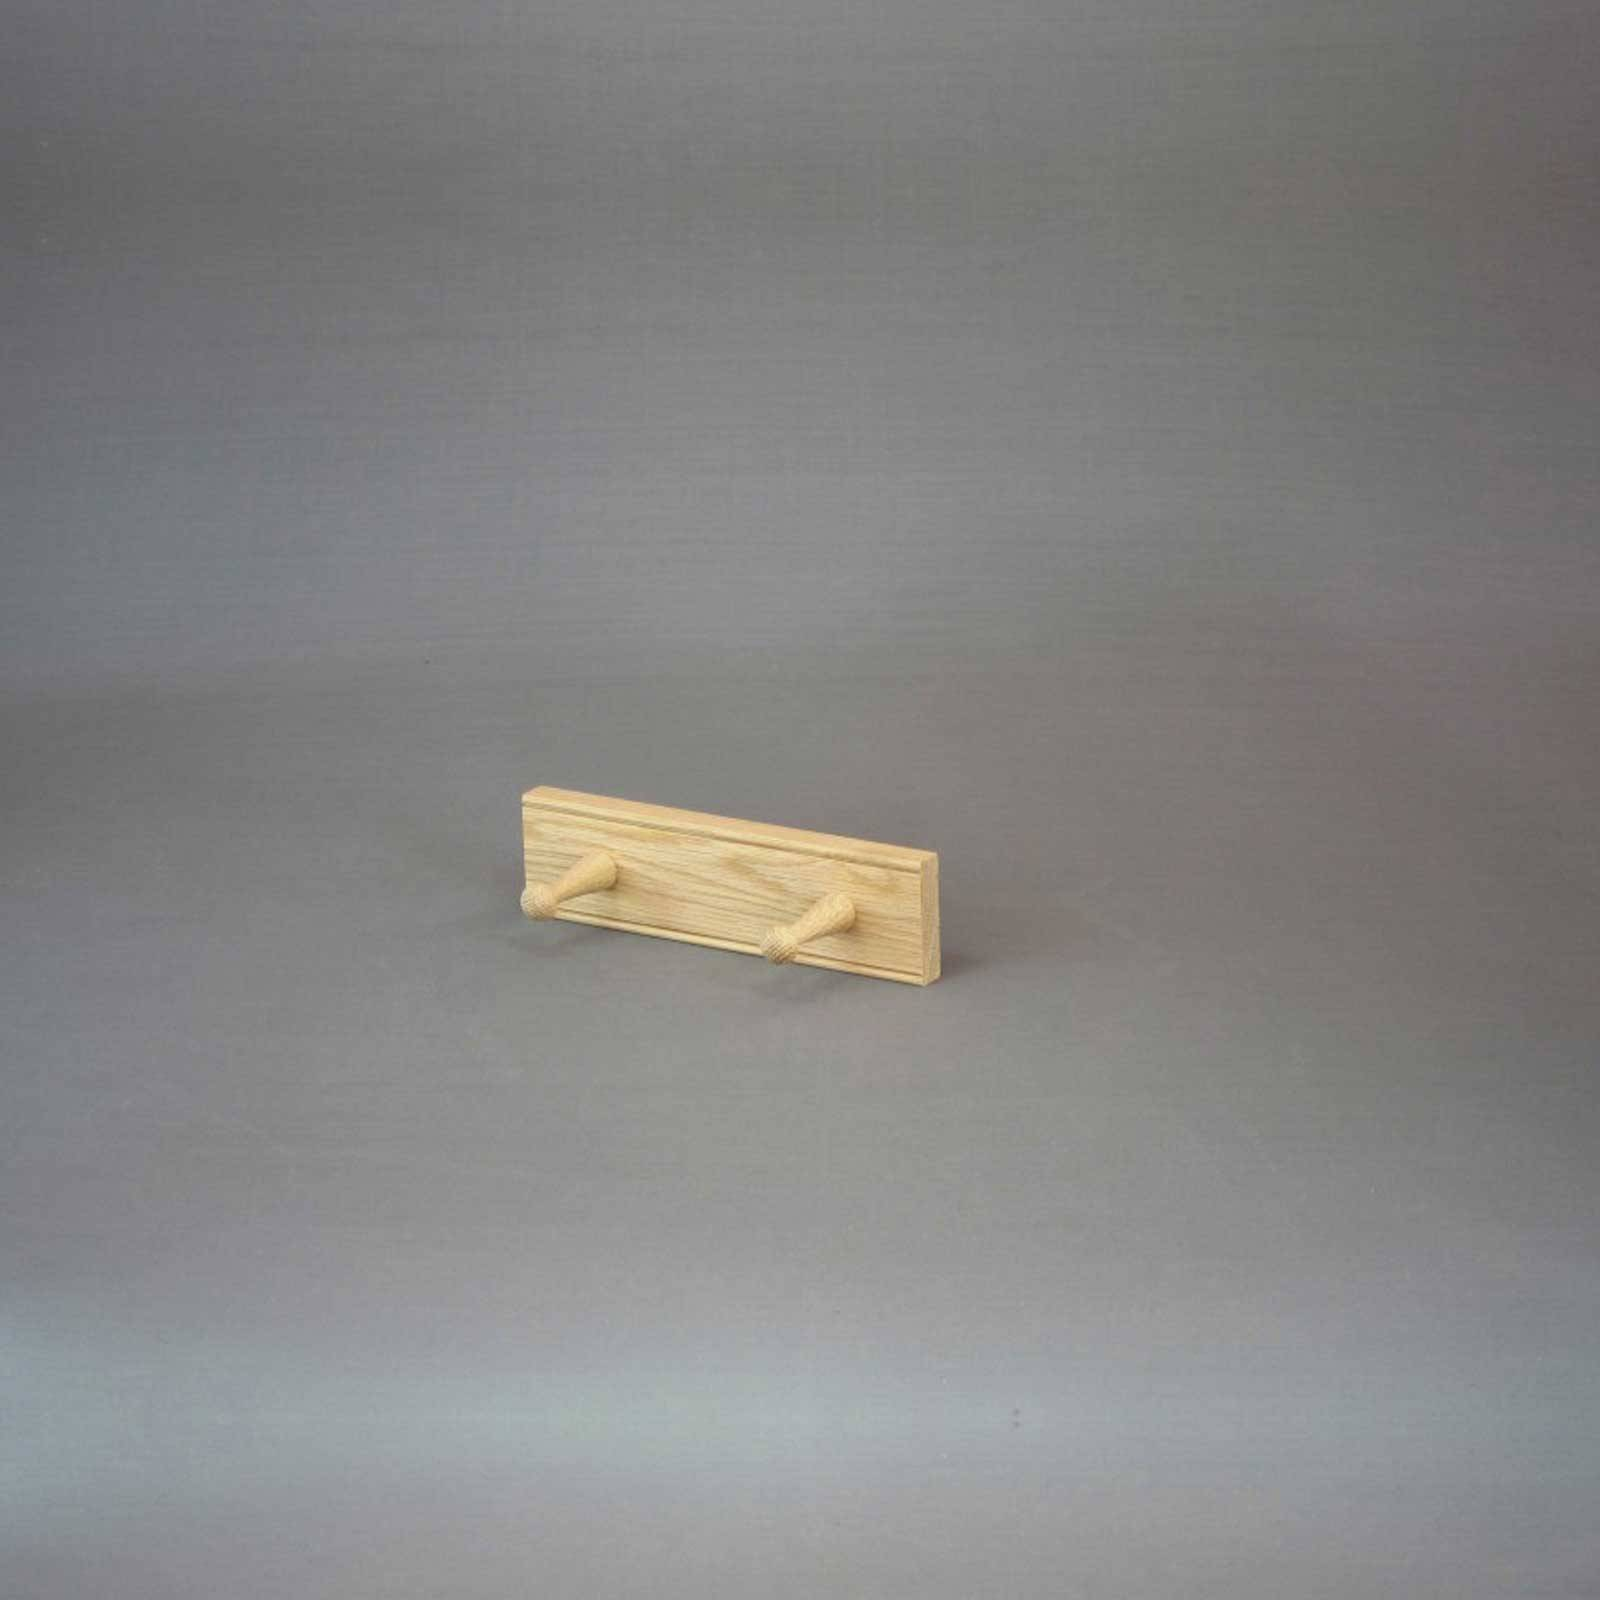 Oak 2 Peg Rail Shaker Style 25.5cm x 9cm x 7cm thumbnails